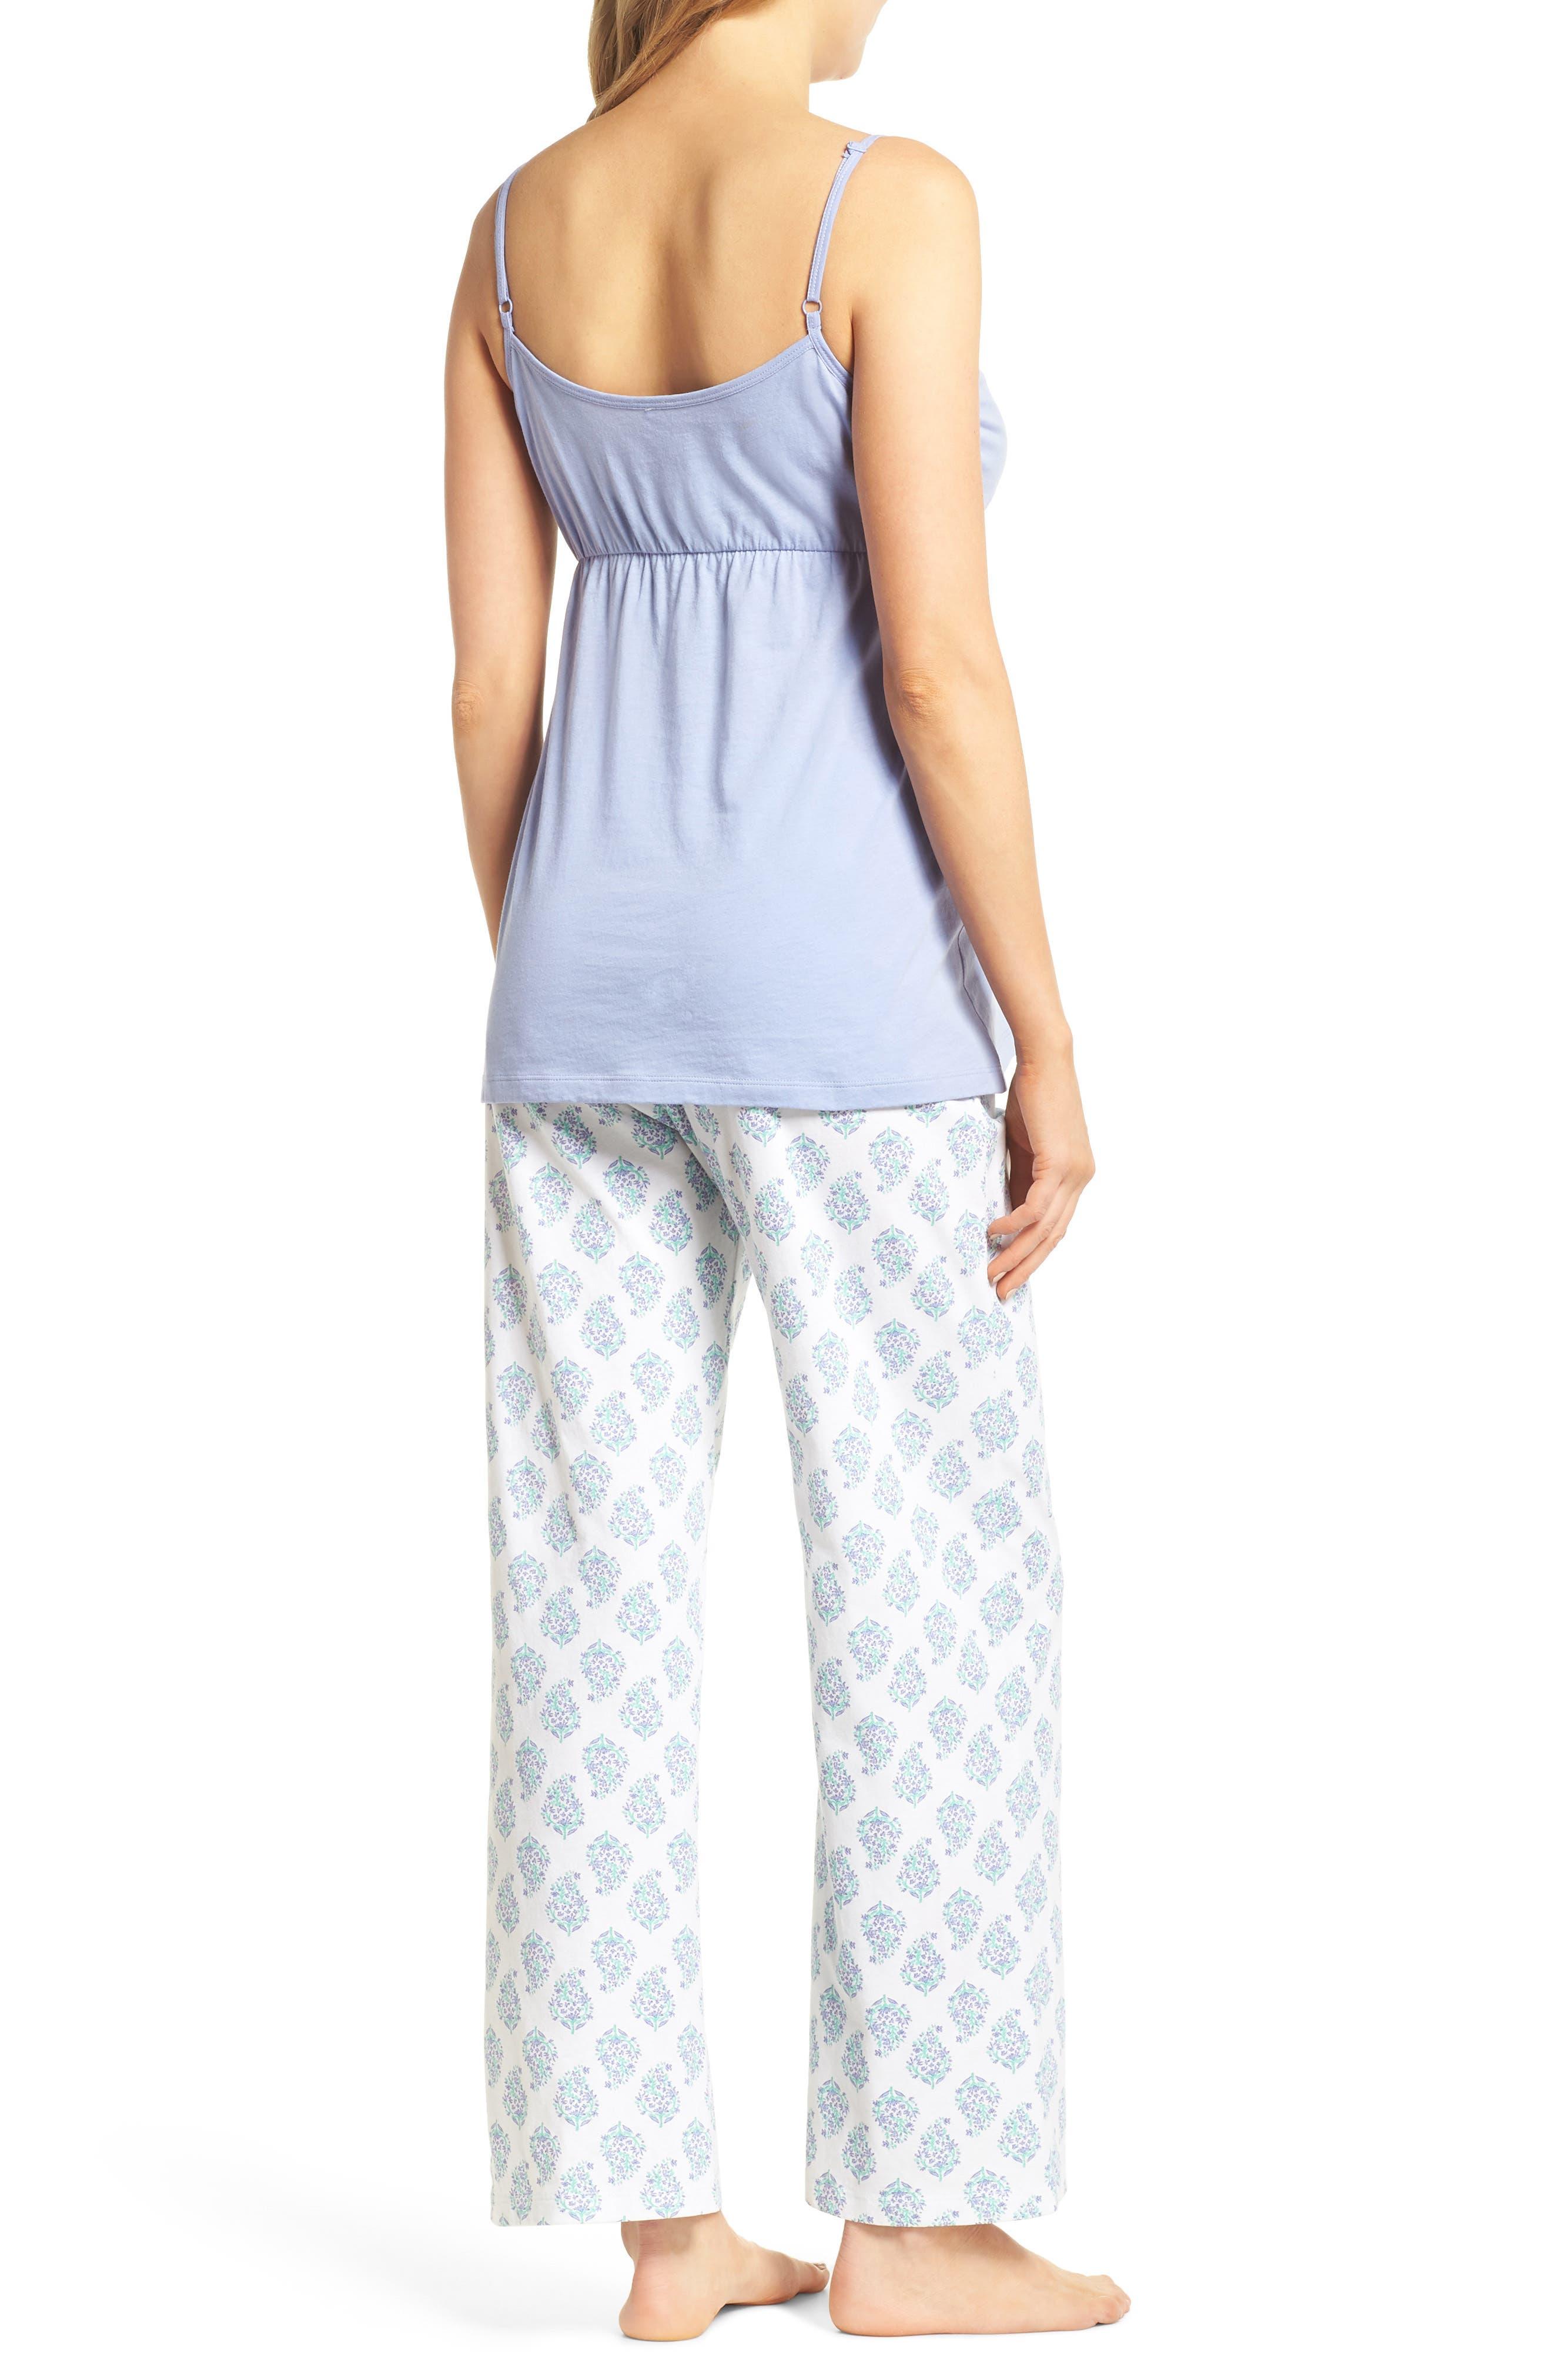 BELABUMBUM,                             Violette Maternity/Nursing Pajamas,                             Alternate thumbnail 2, color,                             503